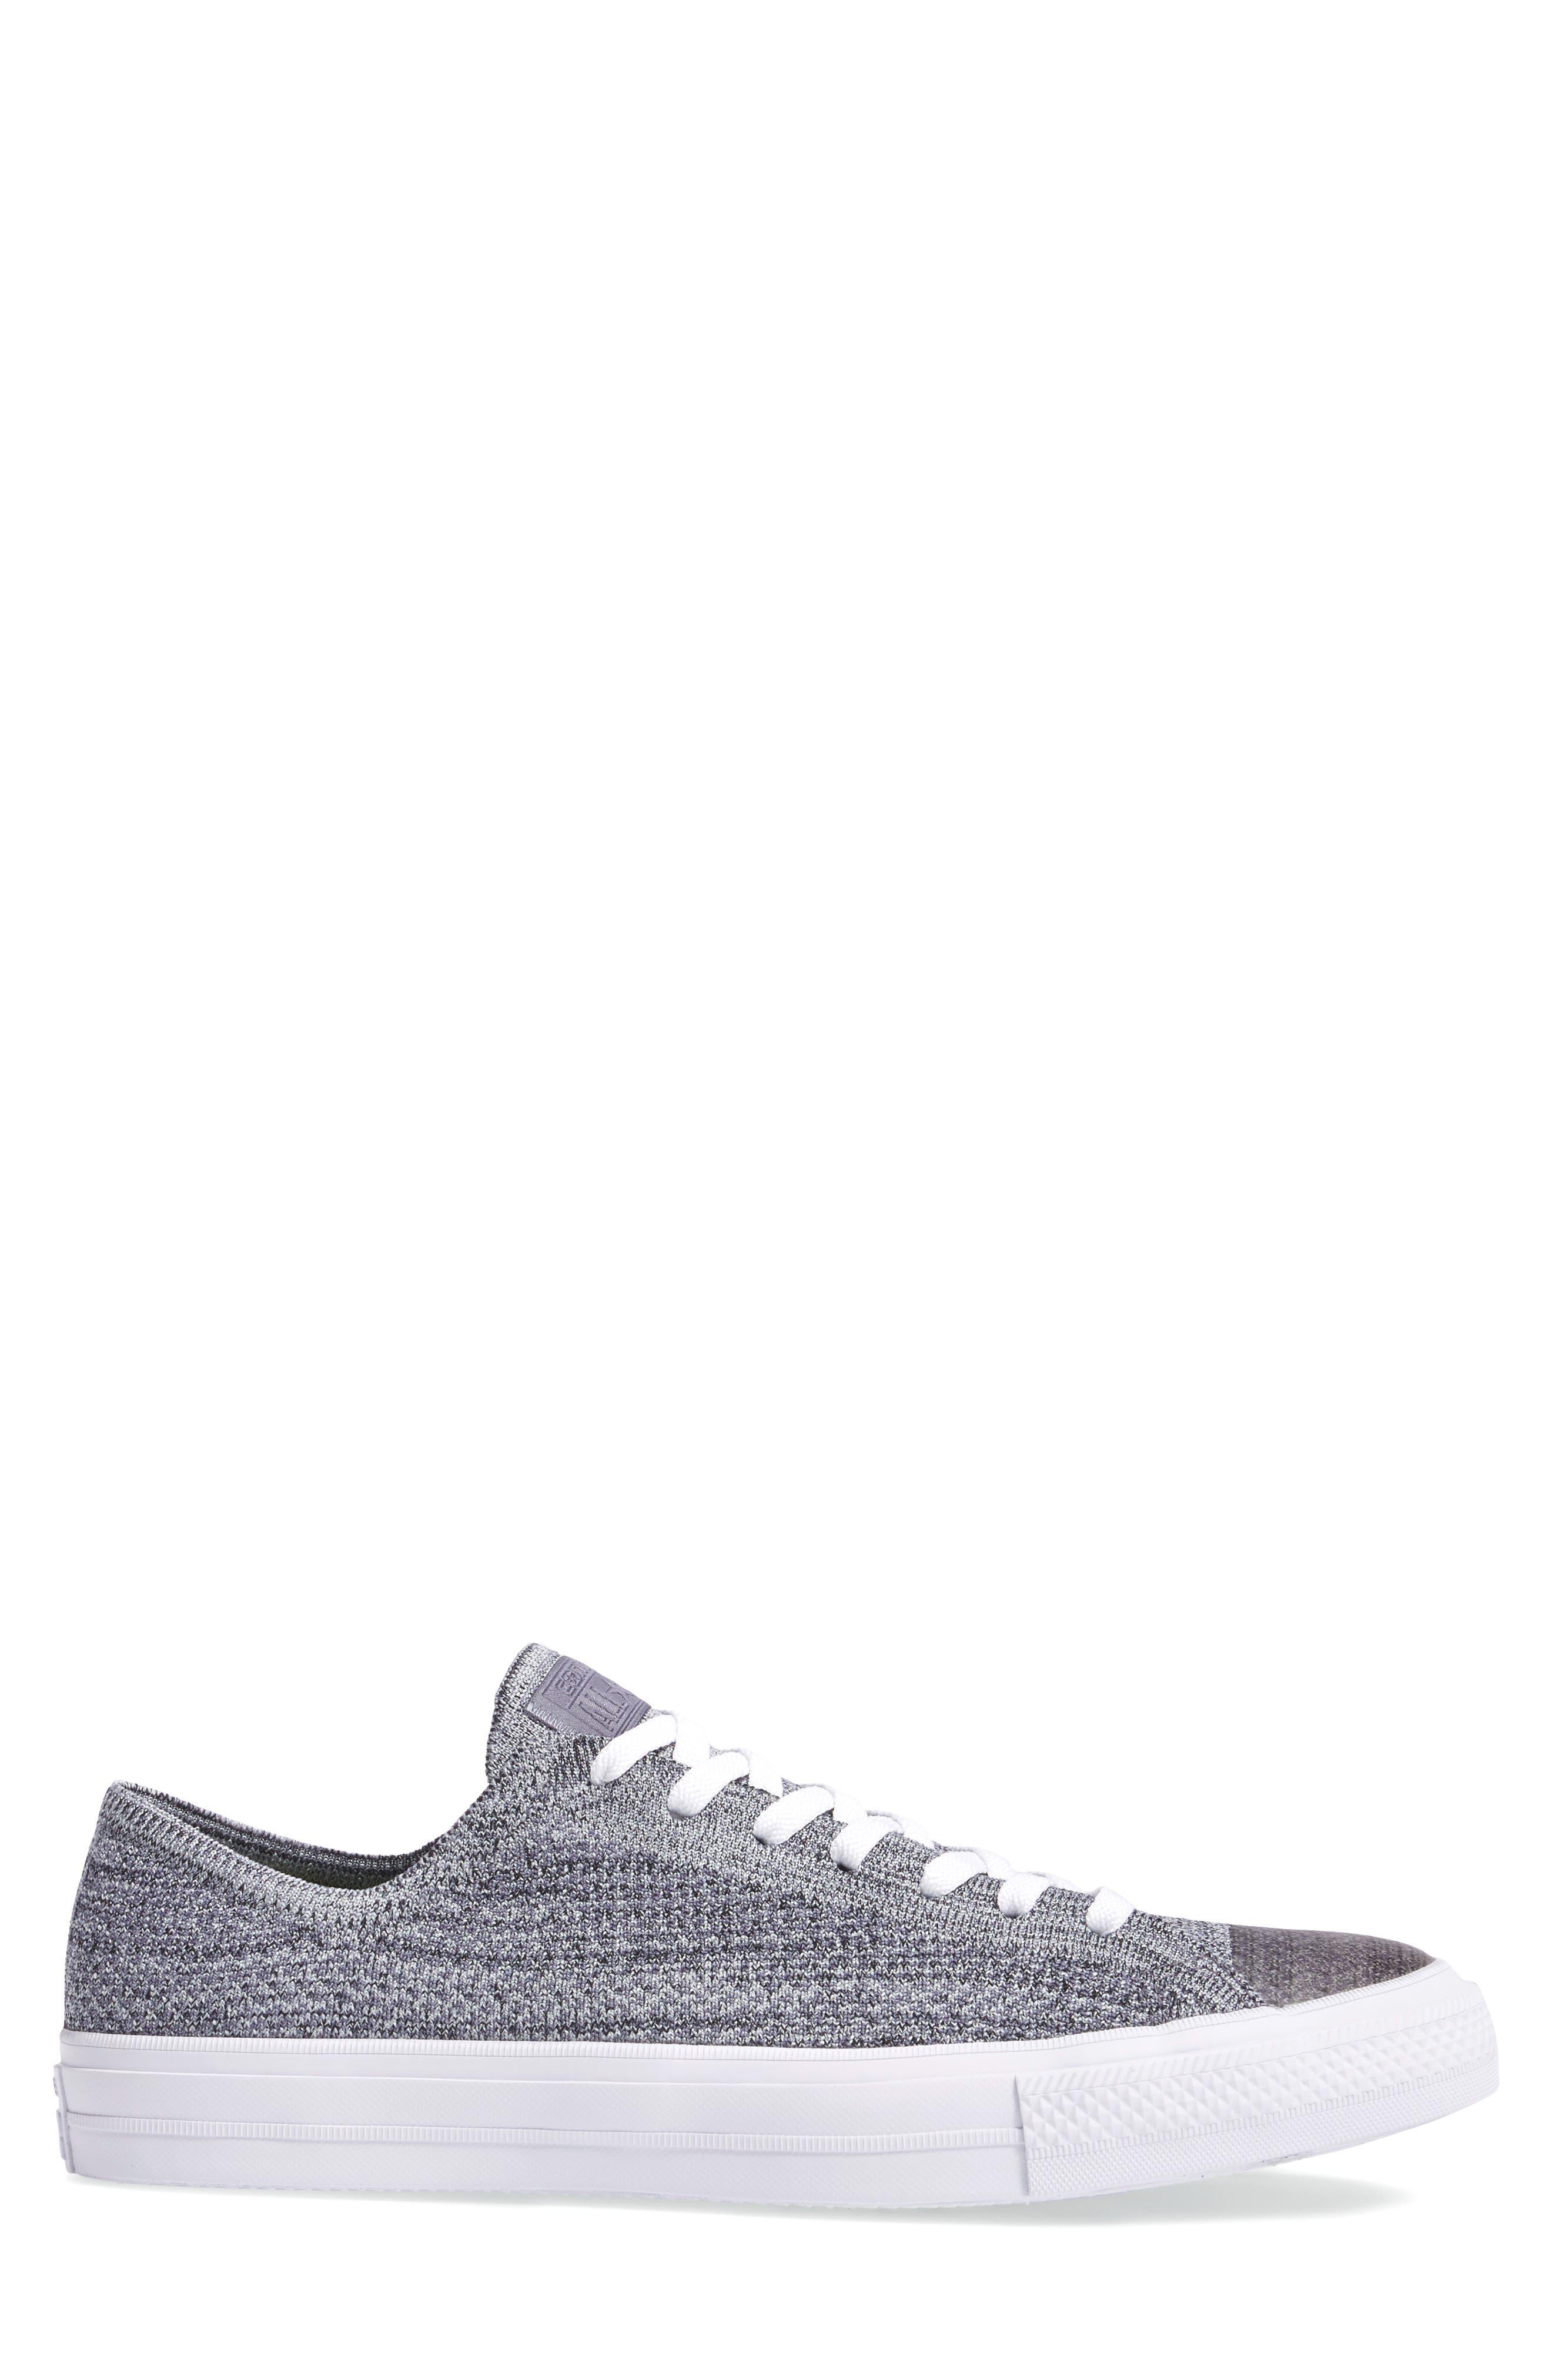 Alternate Image 3  - Converse Chuck Taylor® All Star® Flyknit Sneaker (Men)